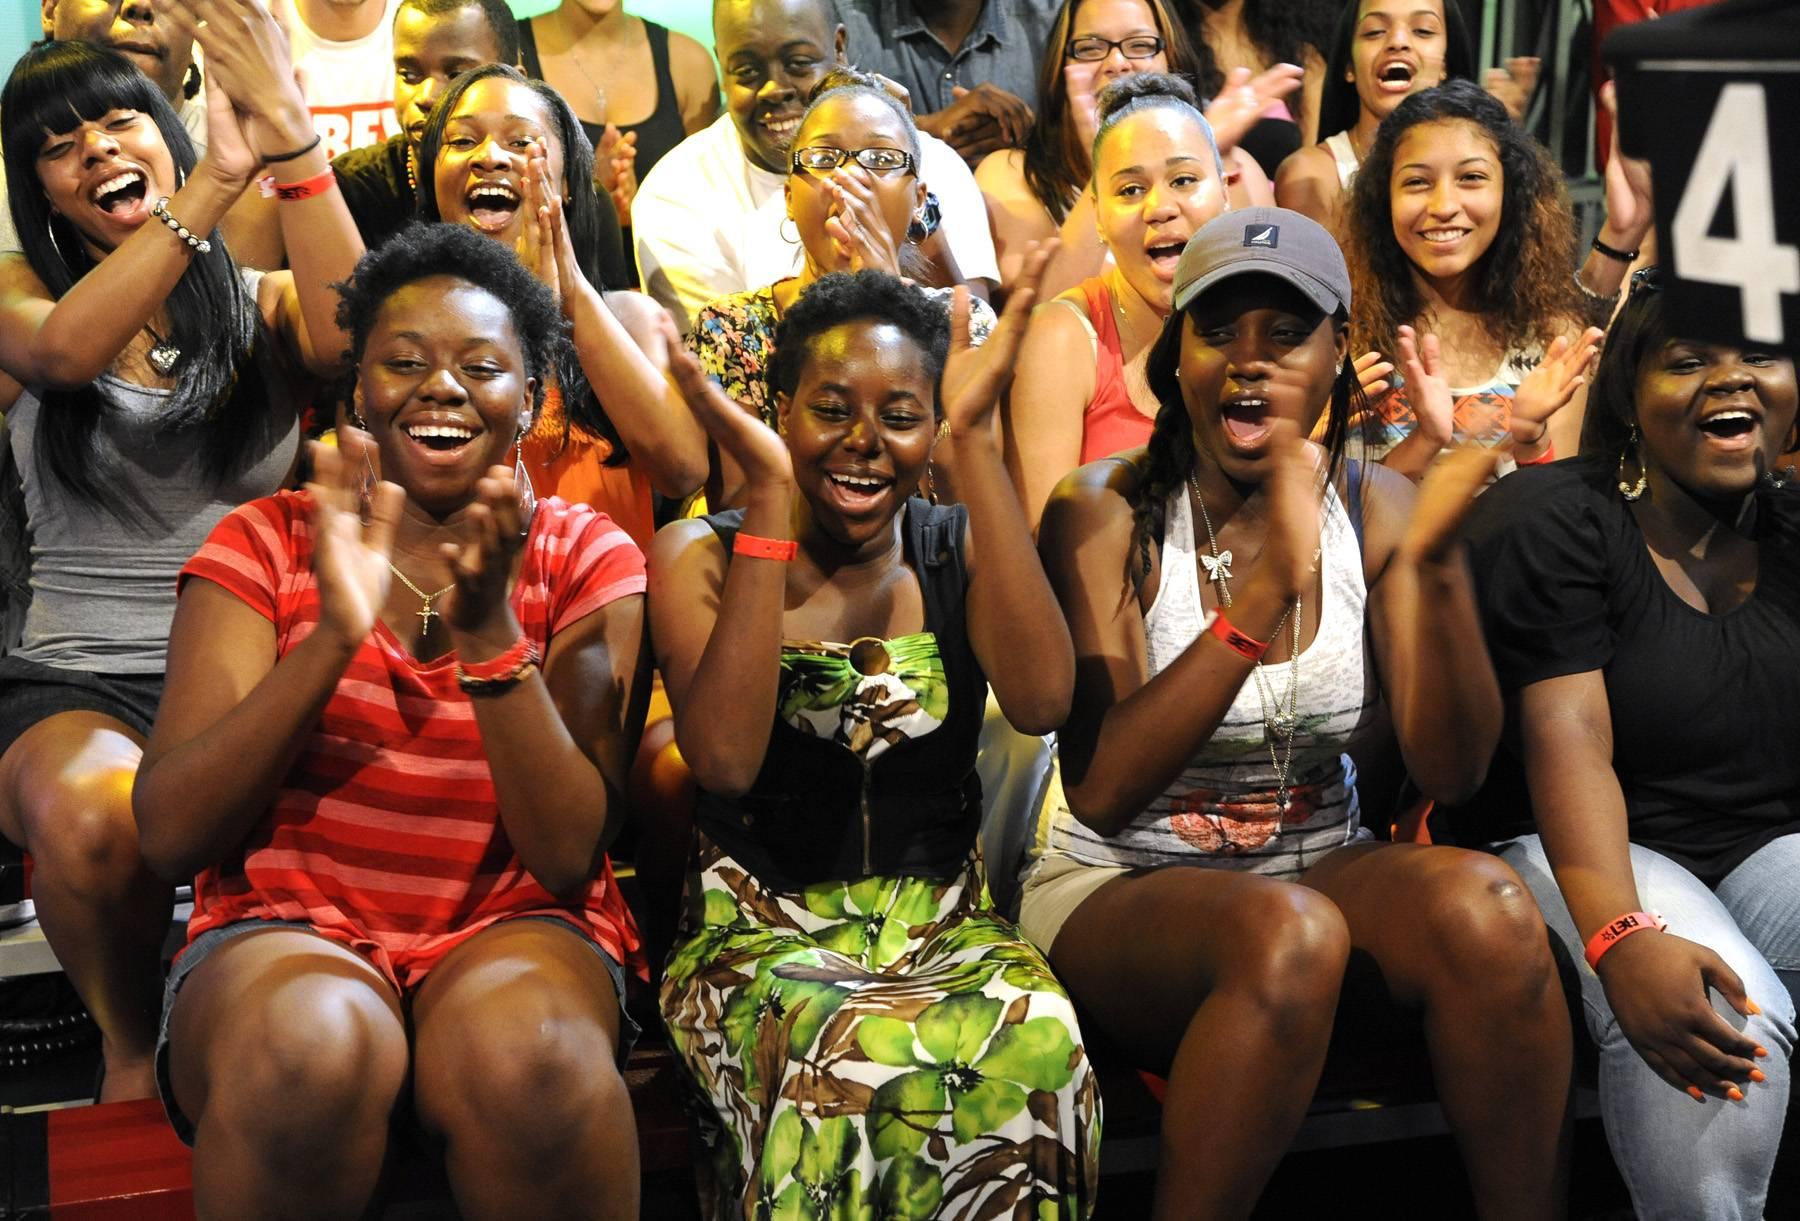 Hey Yall - Audience members at 106 & Park, May 29, 2012. (Photo: John Ricard / BET)